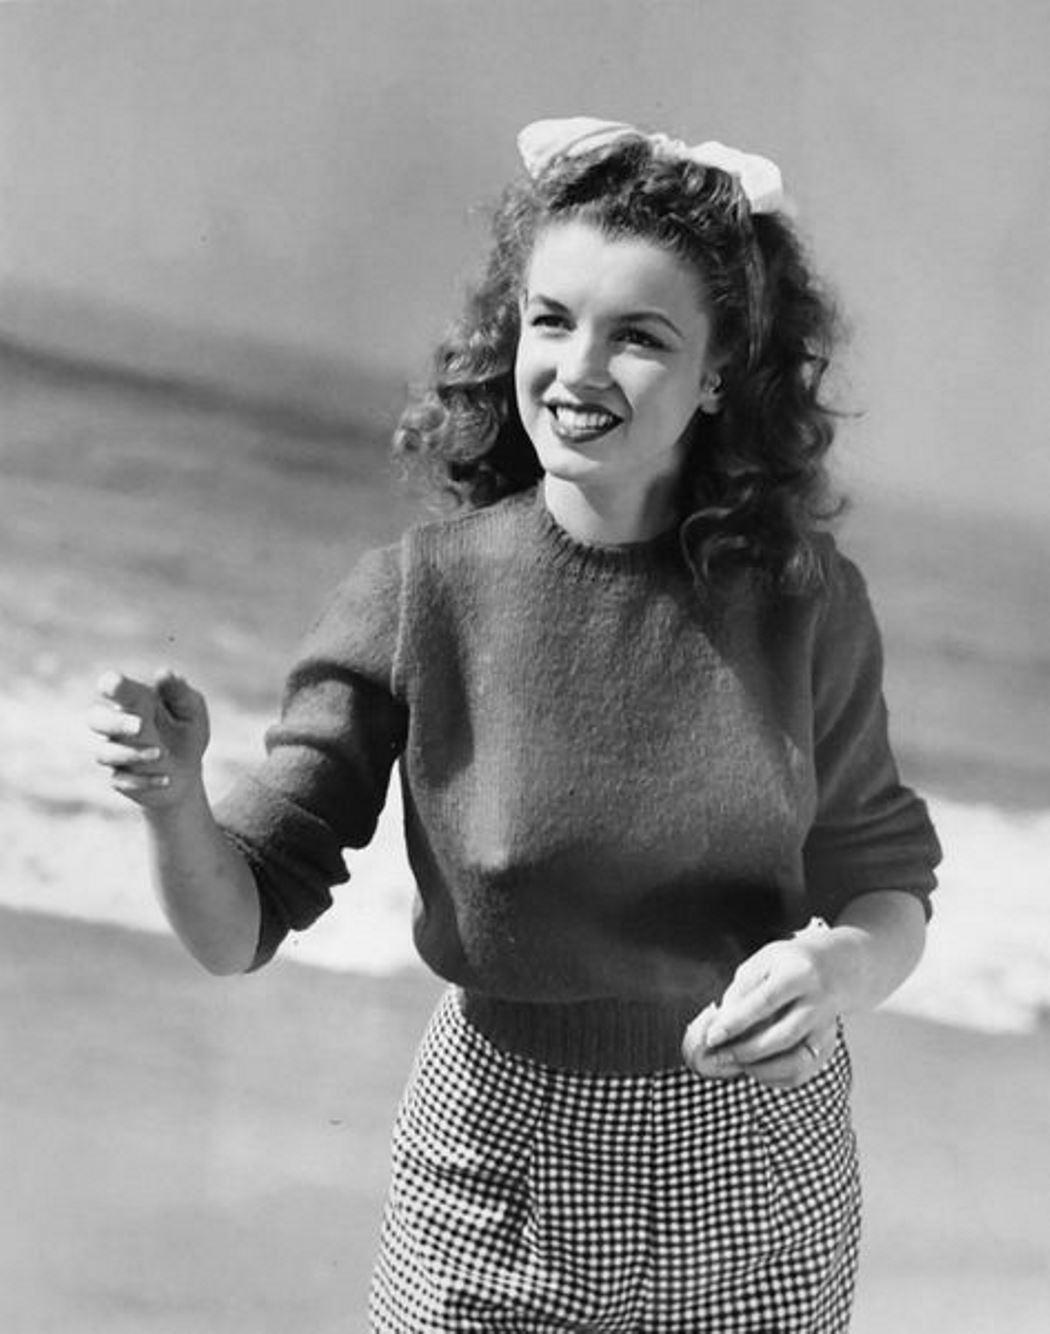 Norma Jeane Dougherty